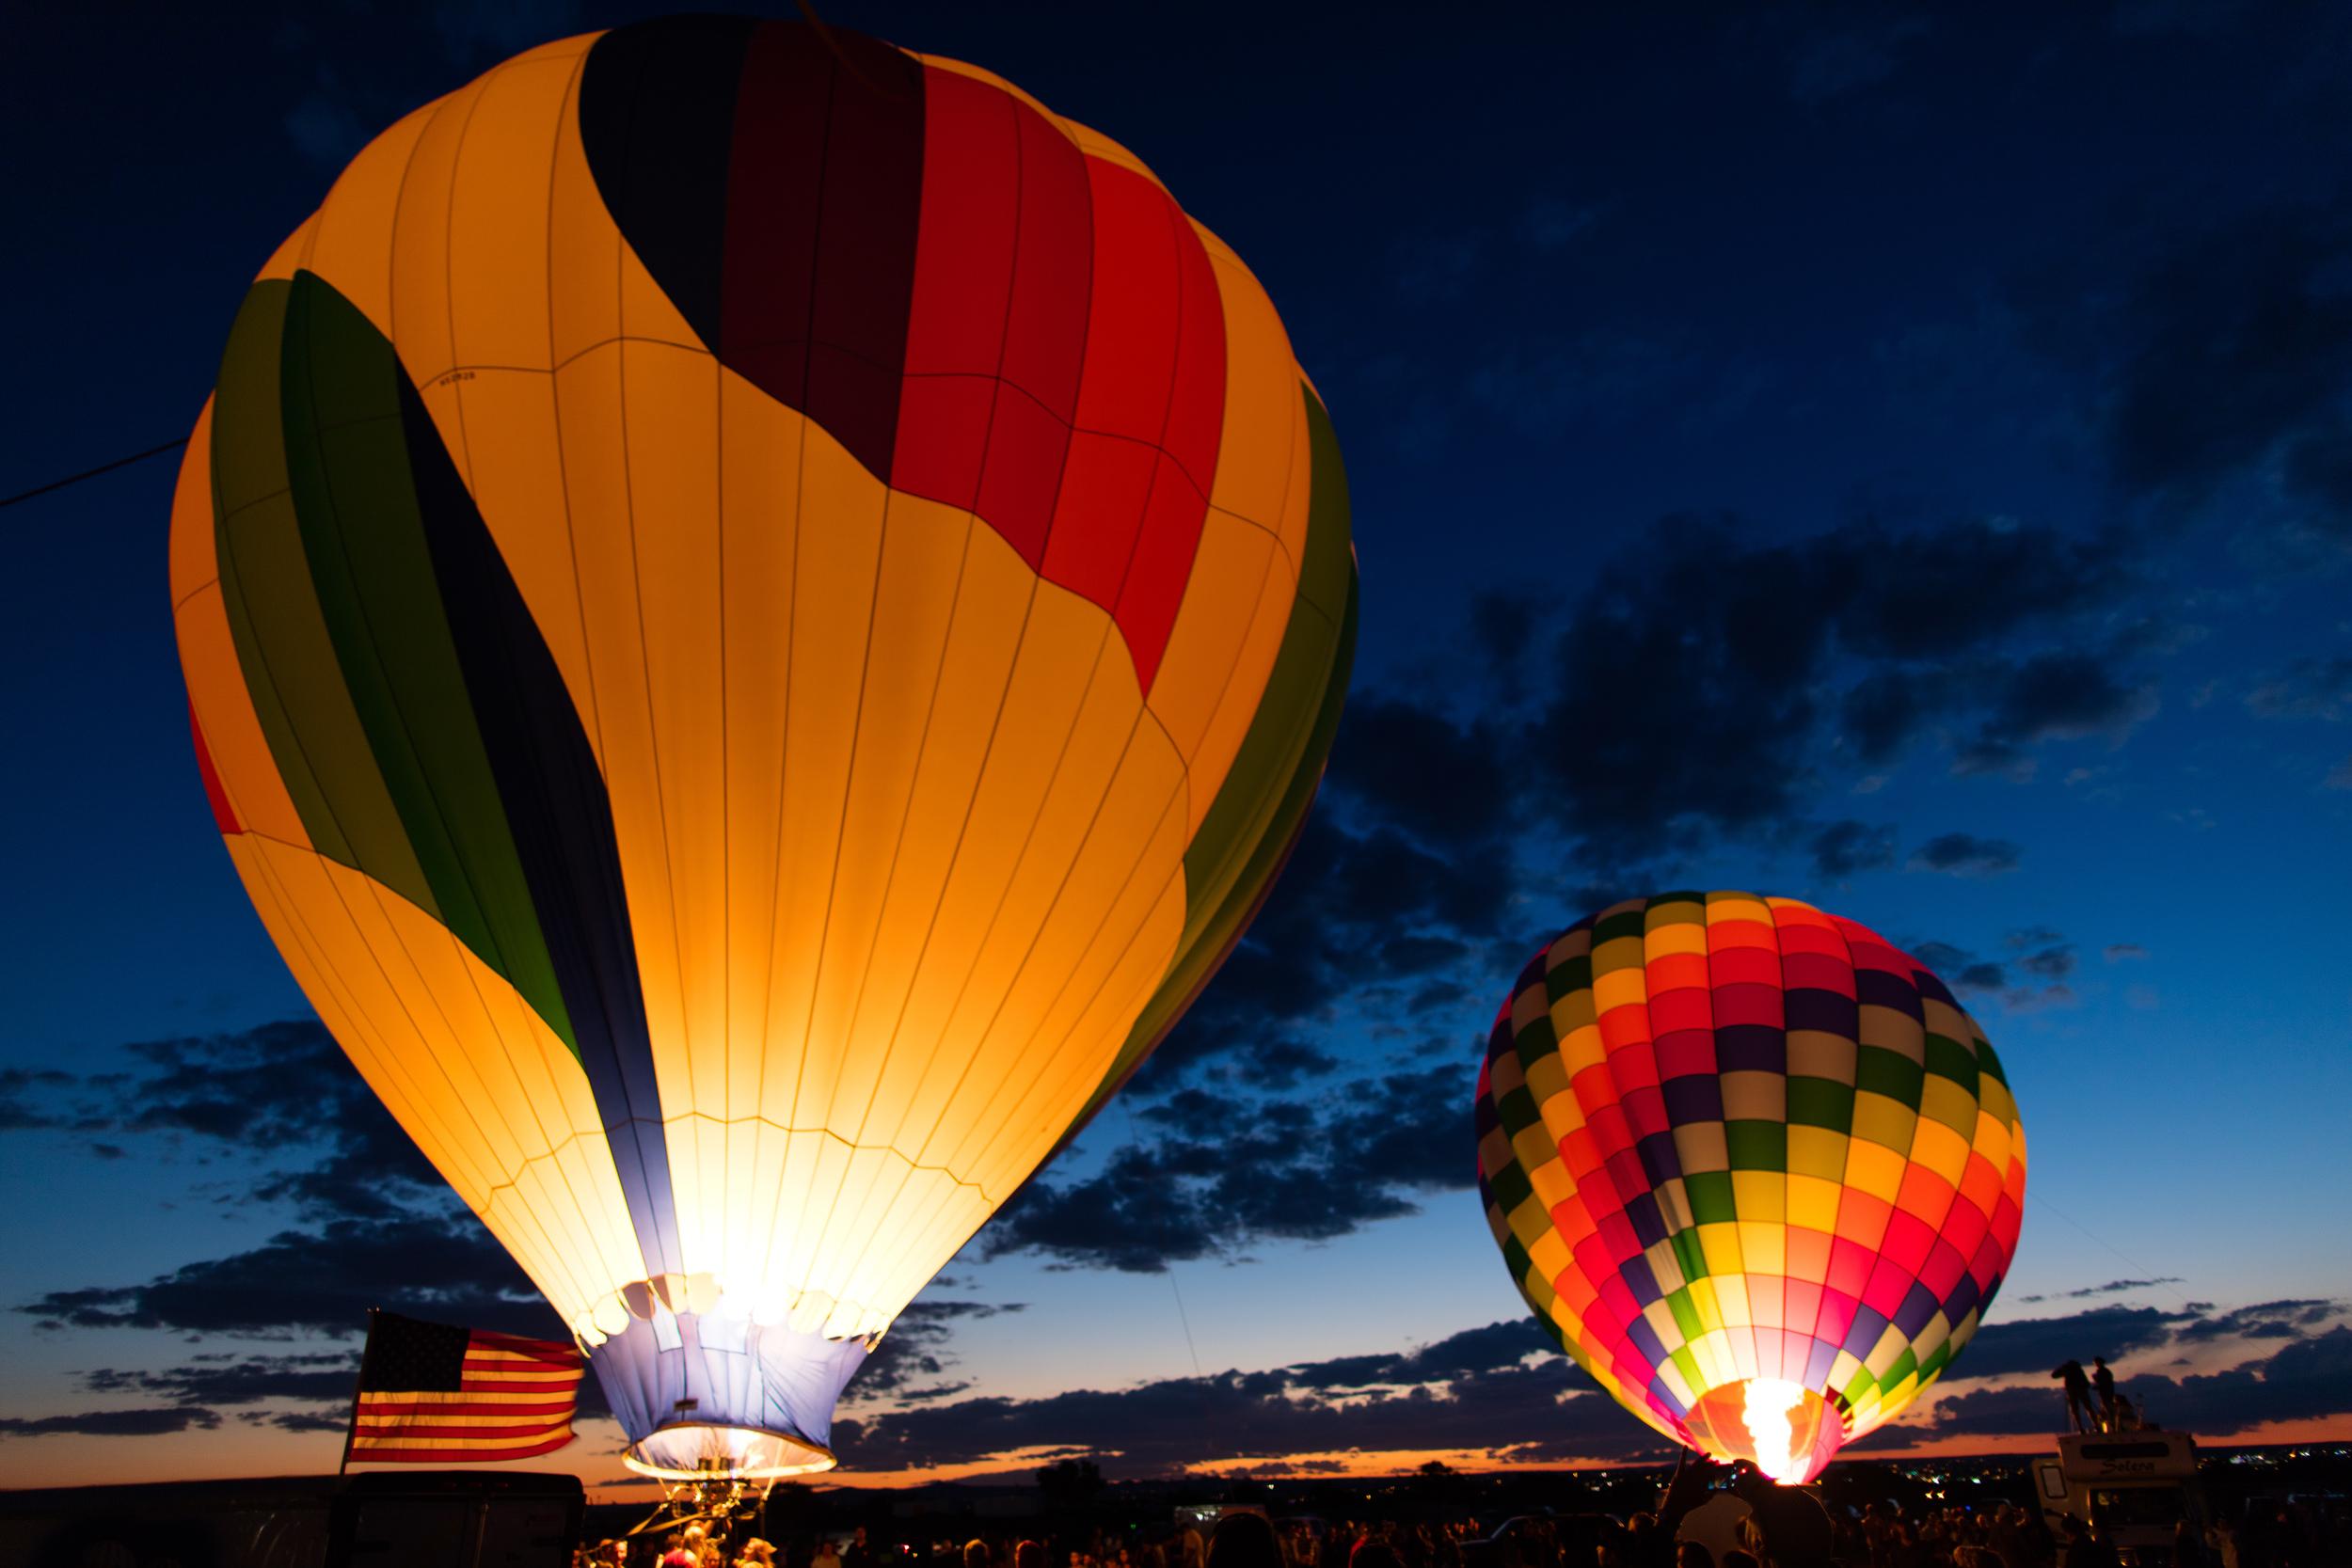 Evening Glow, Albuquerque, New Mexico